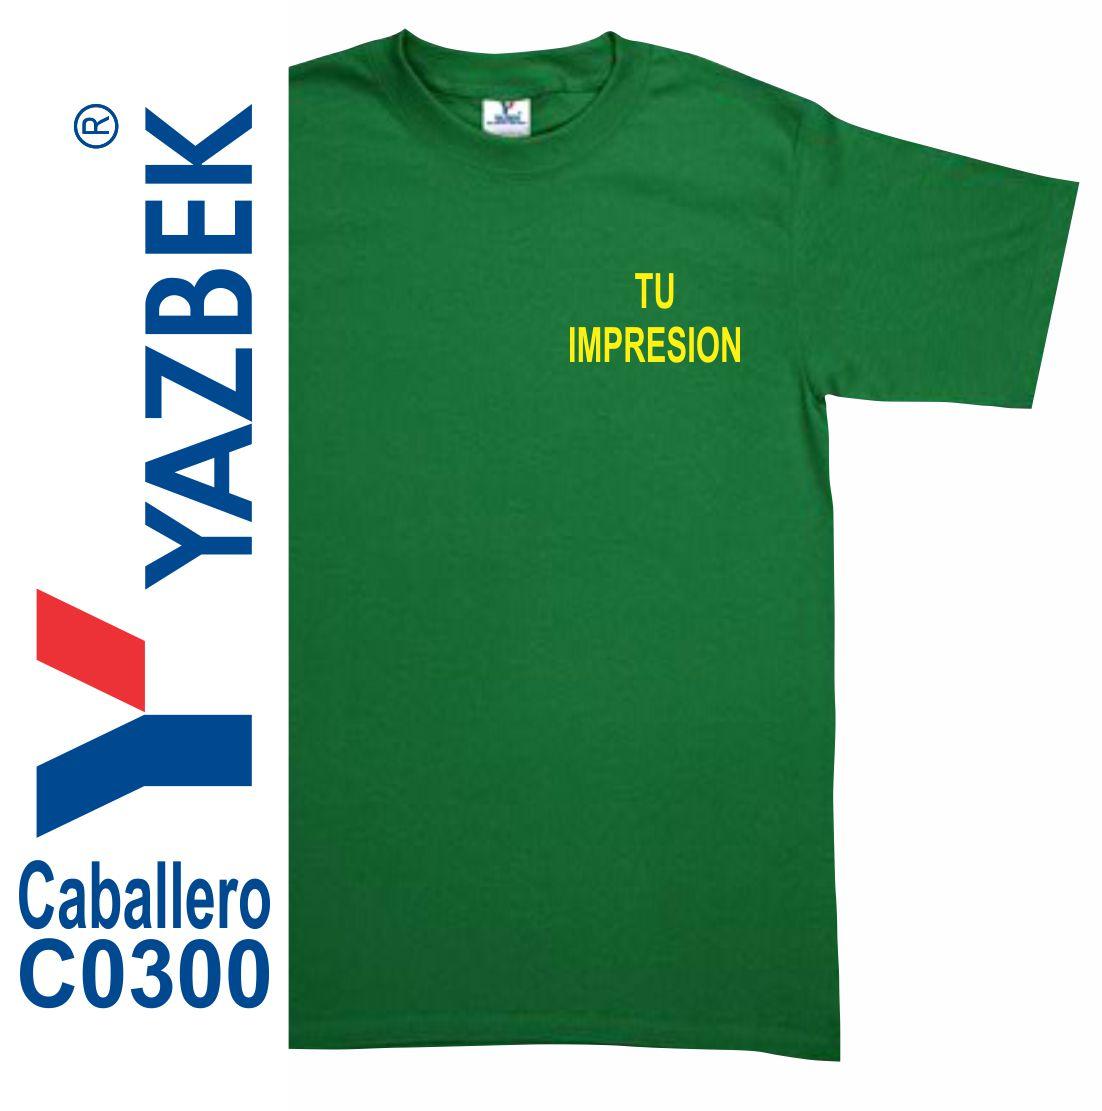 Playera Yazbek C0300 Caballero  738427bf9764b